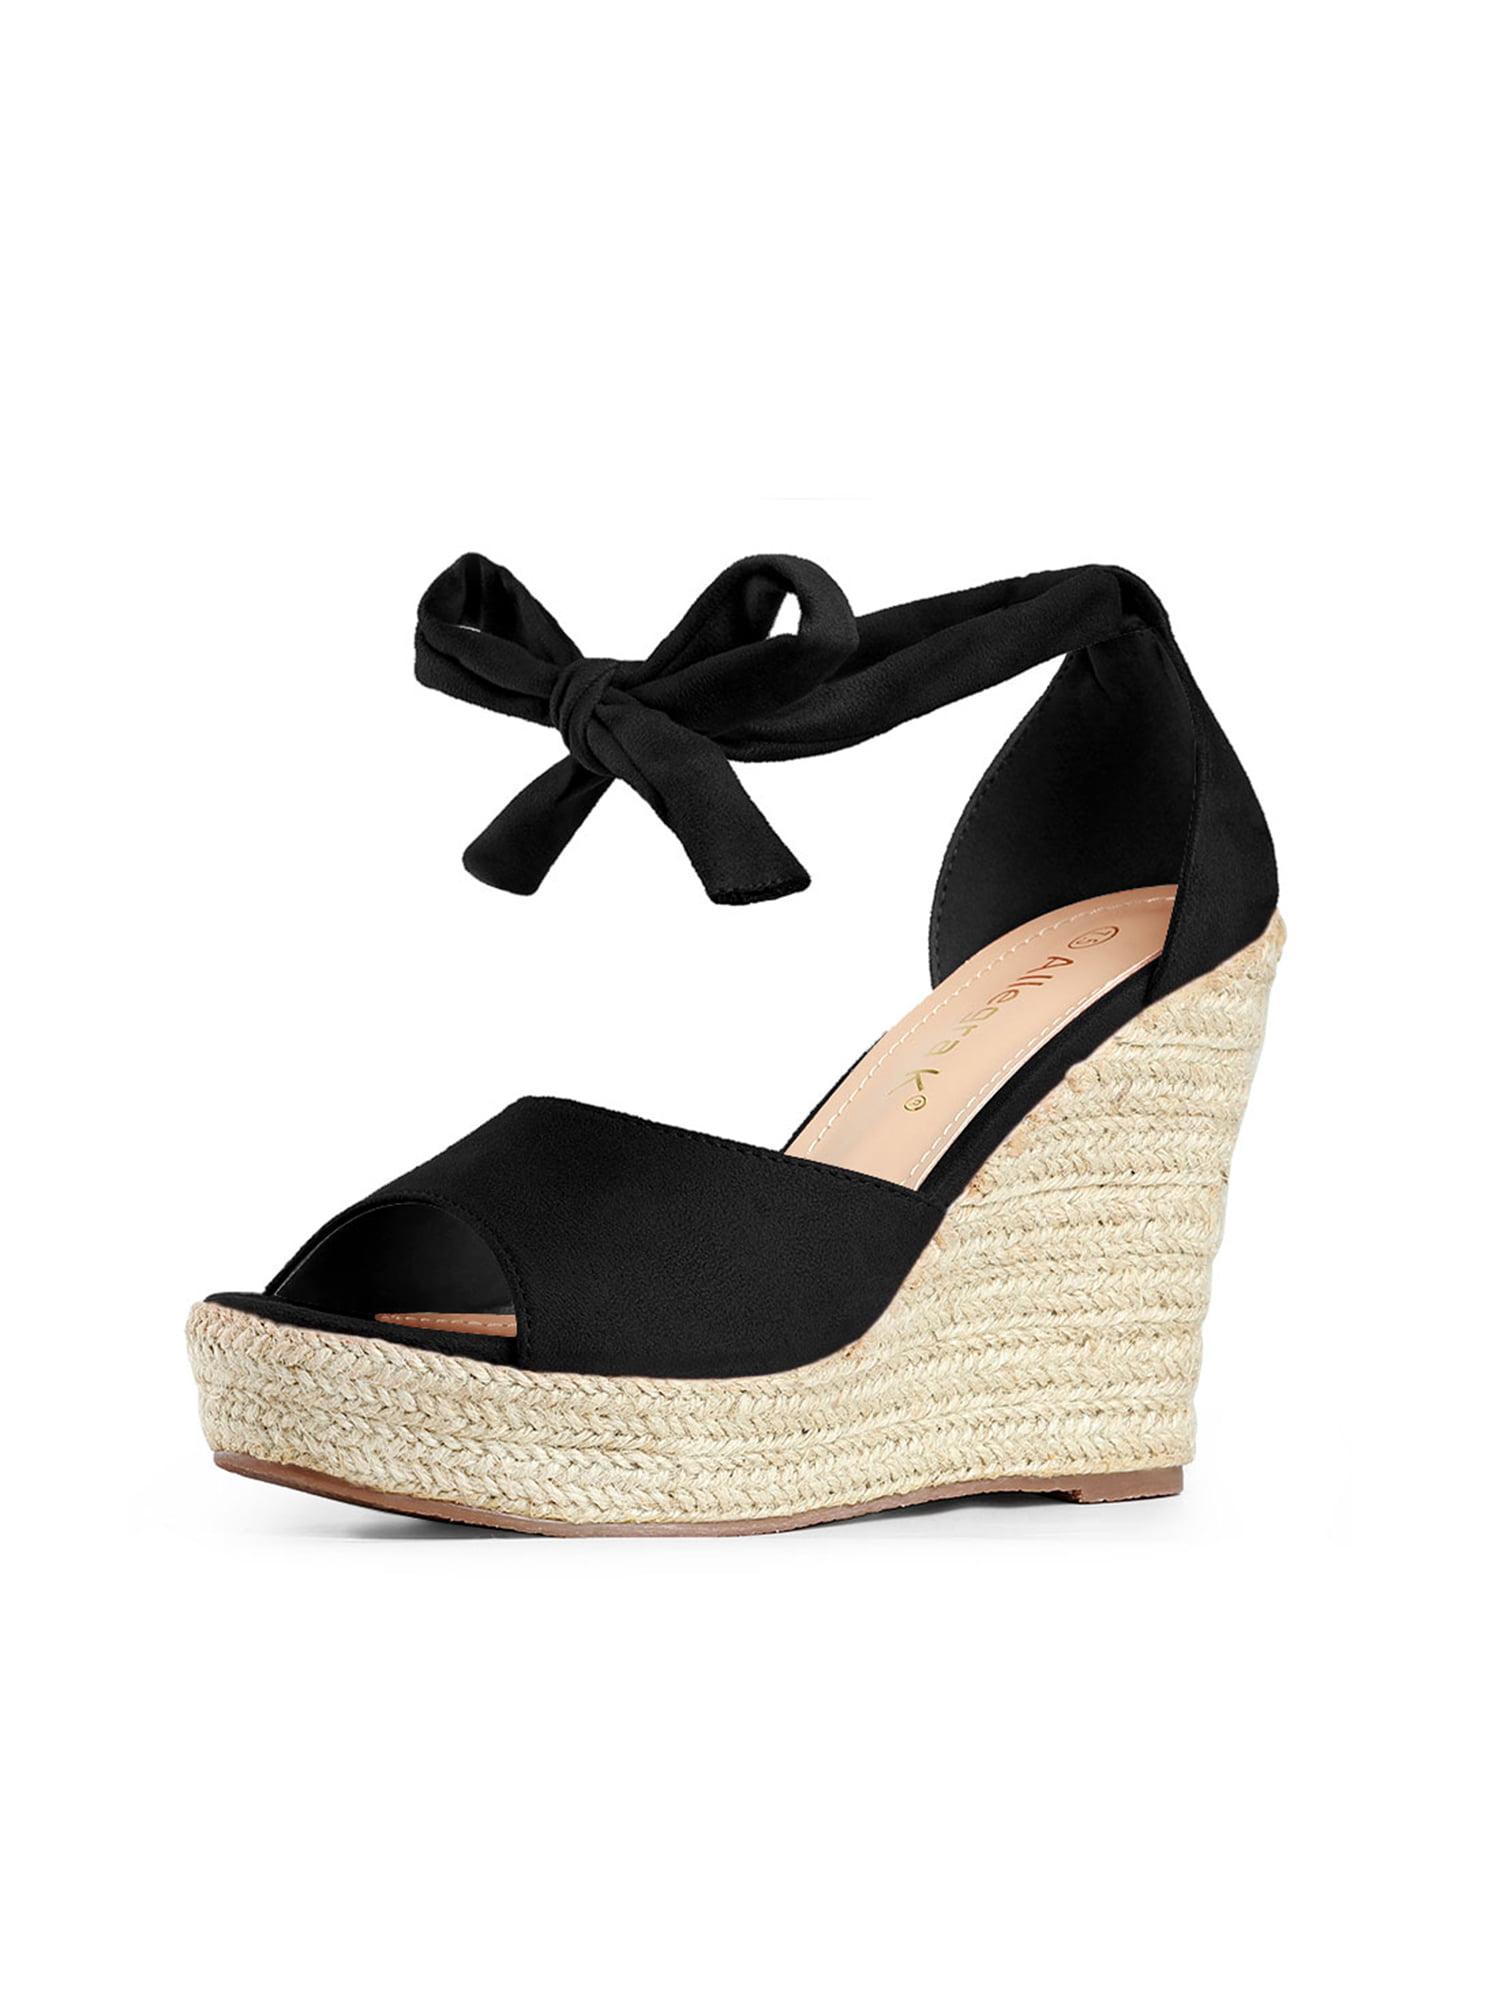 Women's Espadrilles Tie Up Ankle Strap Wedge Black Sandals - 9 M US